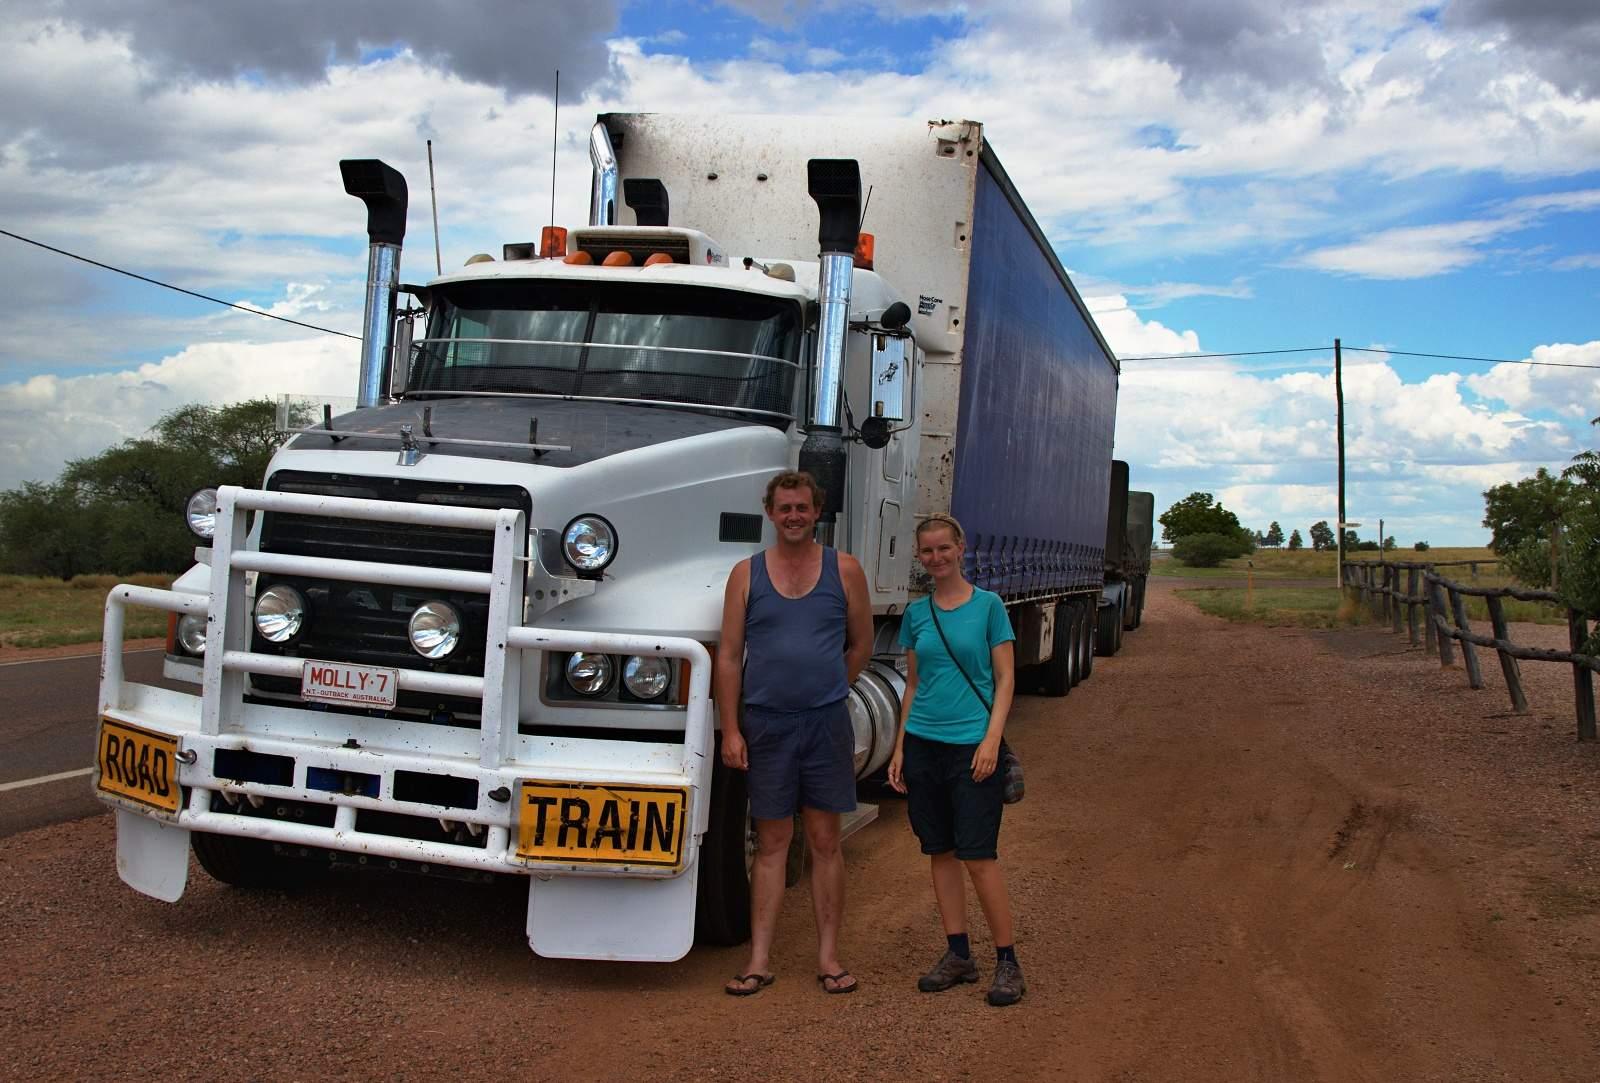 Stopnutý road train v australském Outbacku